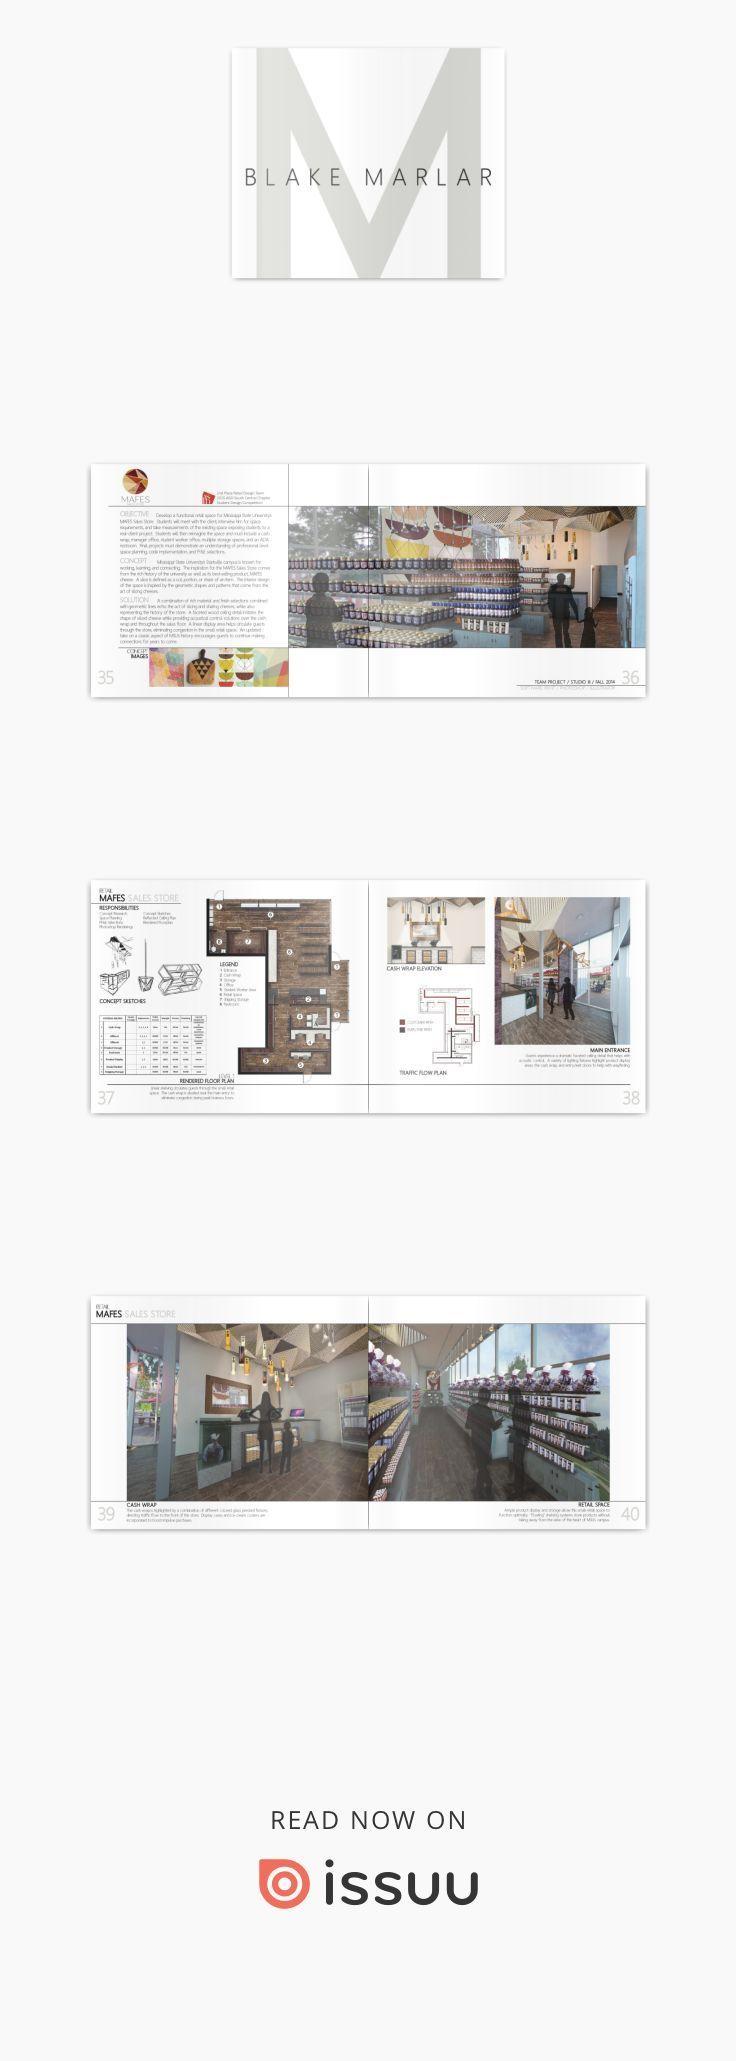 Blake marlar interior design portfolio  collection of my works from the program at mississippi state university also rh pinterest